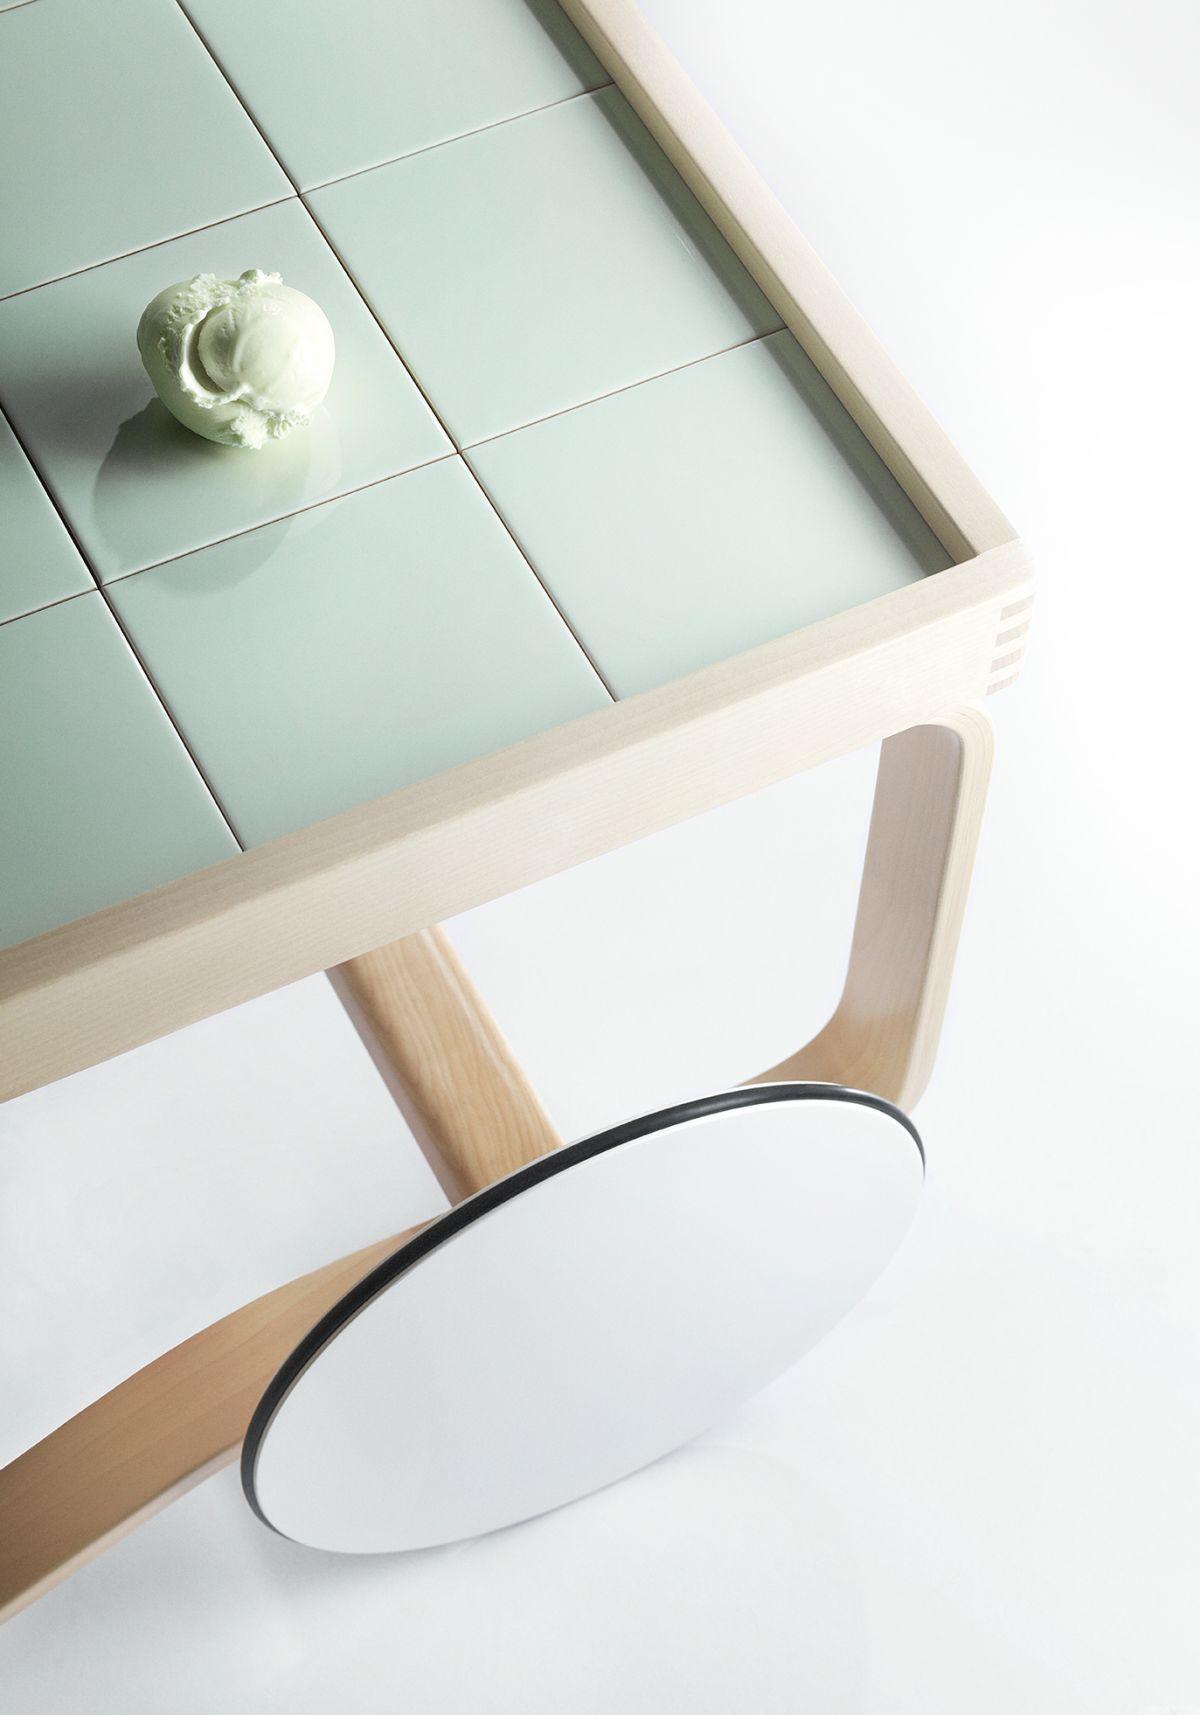 Tea-Trolley-900-Mint-Tiles-Artek-Helsinki-Special-Edition-2016-2008278